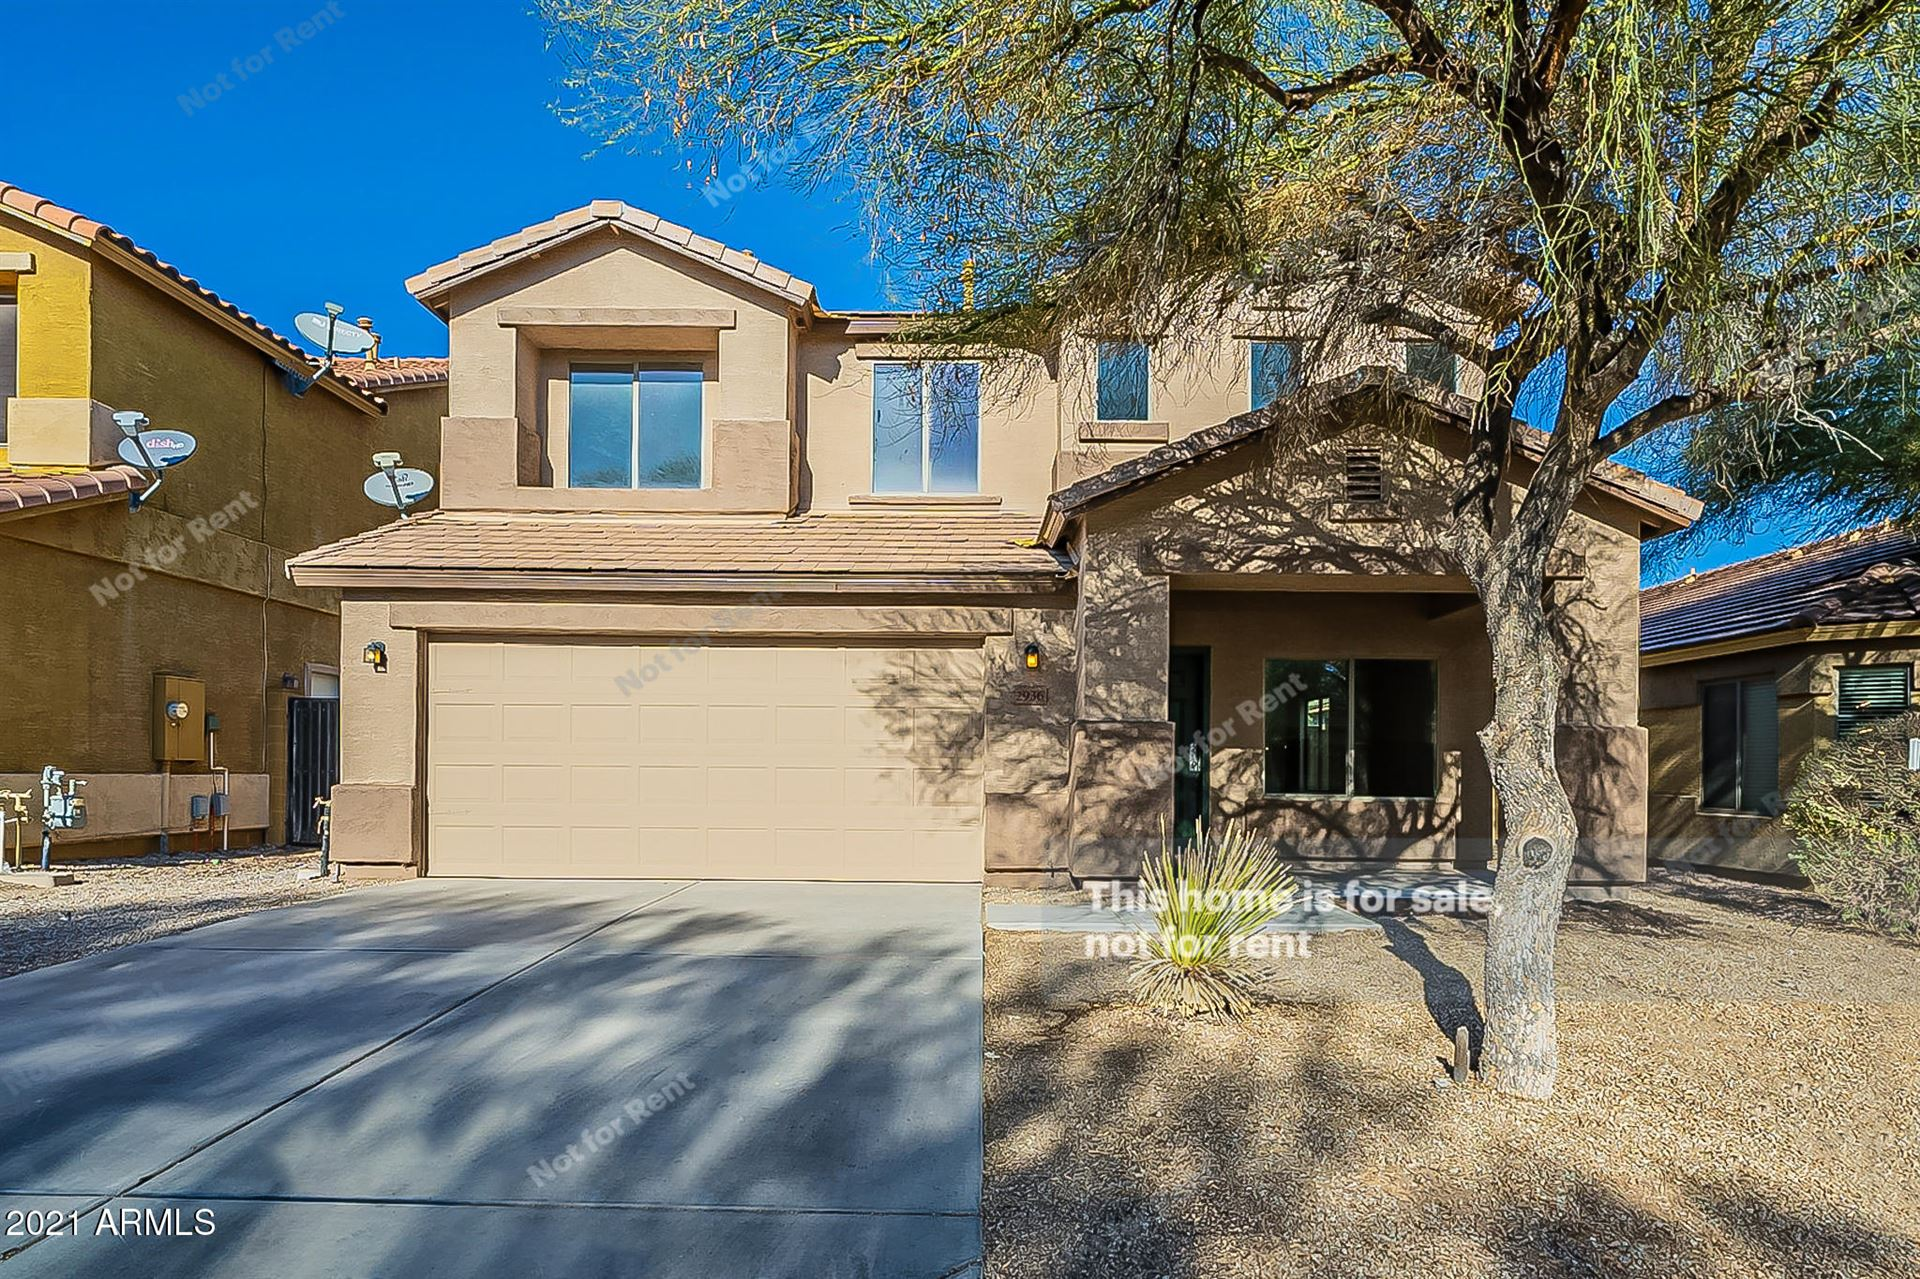 2936 W JASPER BUTTE Drive, Queen Creek, AZ 85142 - MLS#: 6180178